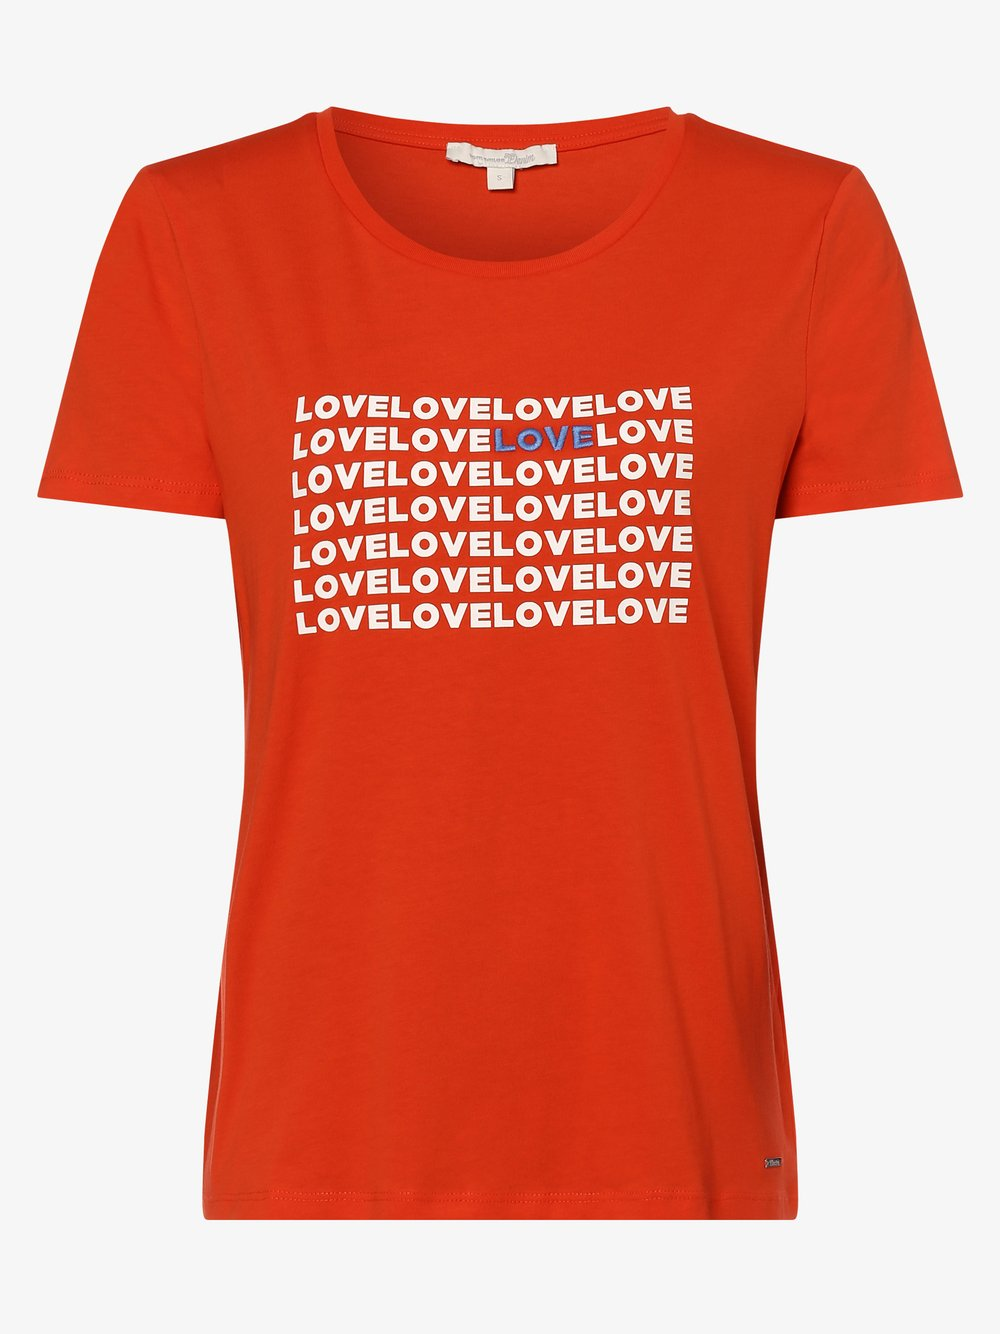 Tom Tailor Denim - T-shirt damski, czerwony Tom Tailor Denim